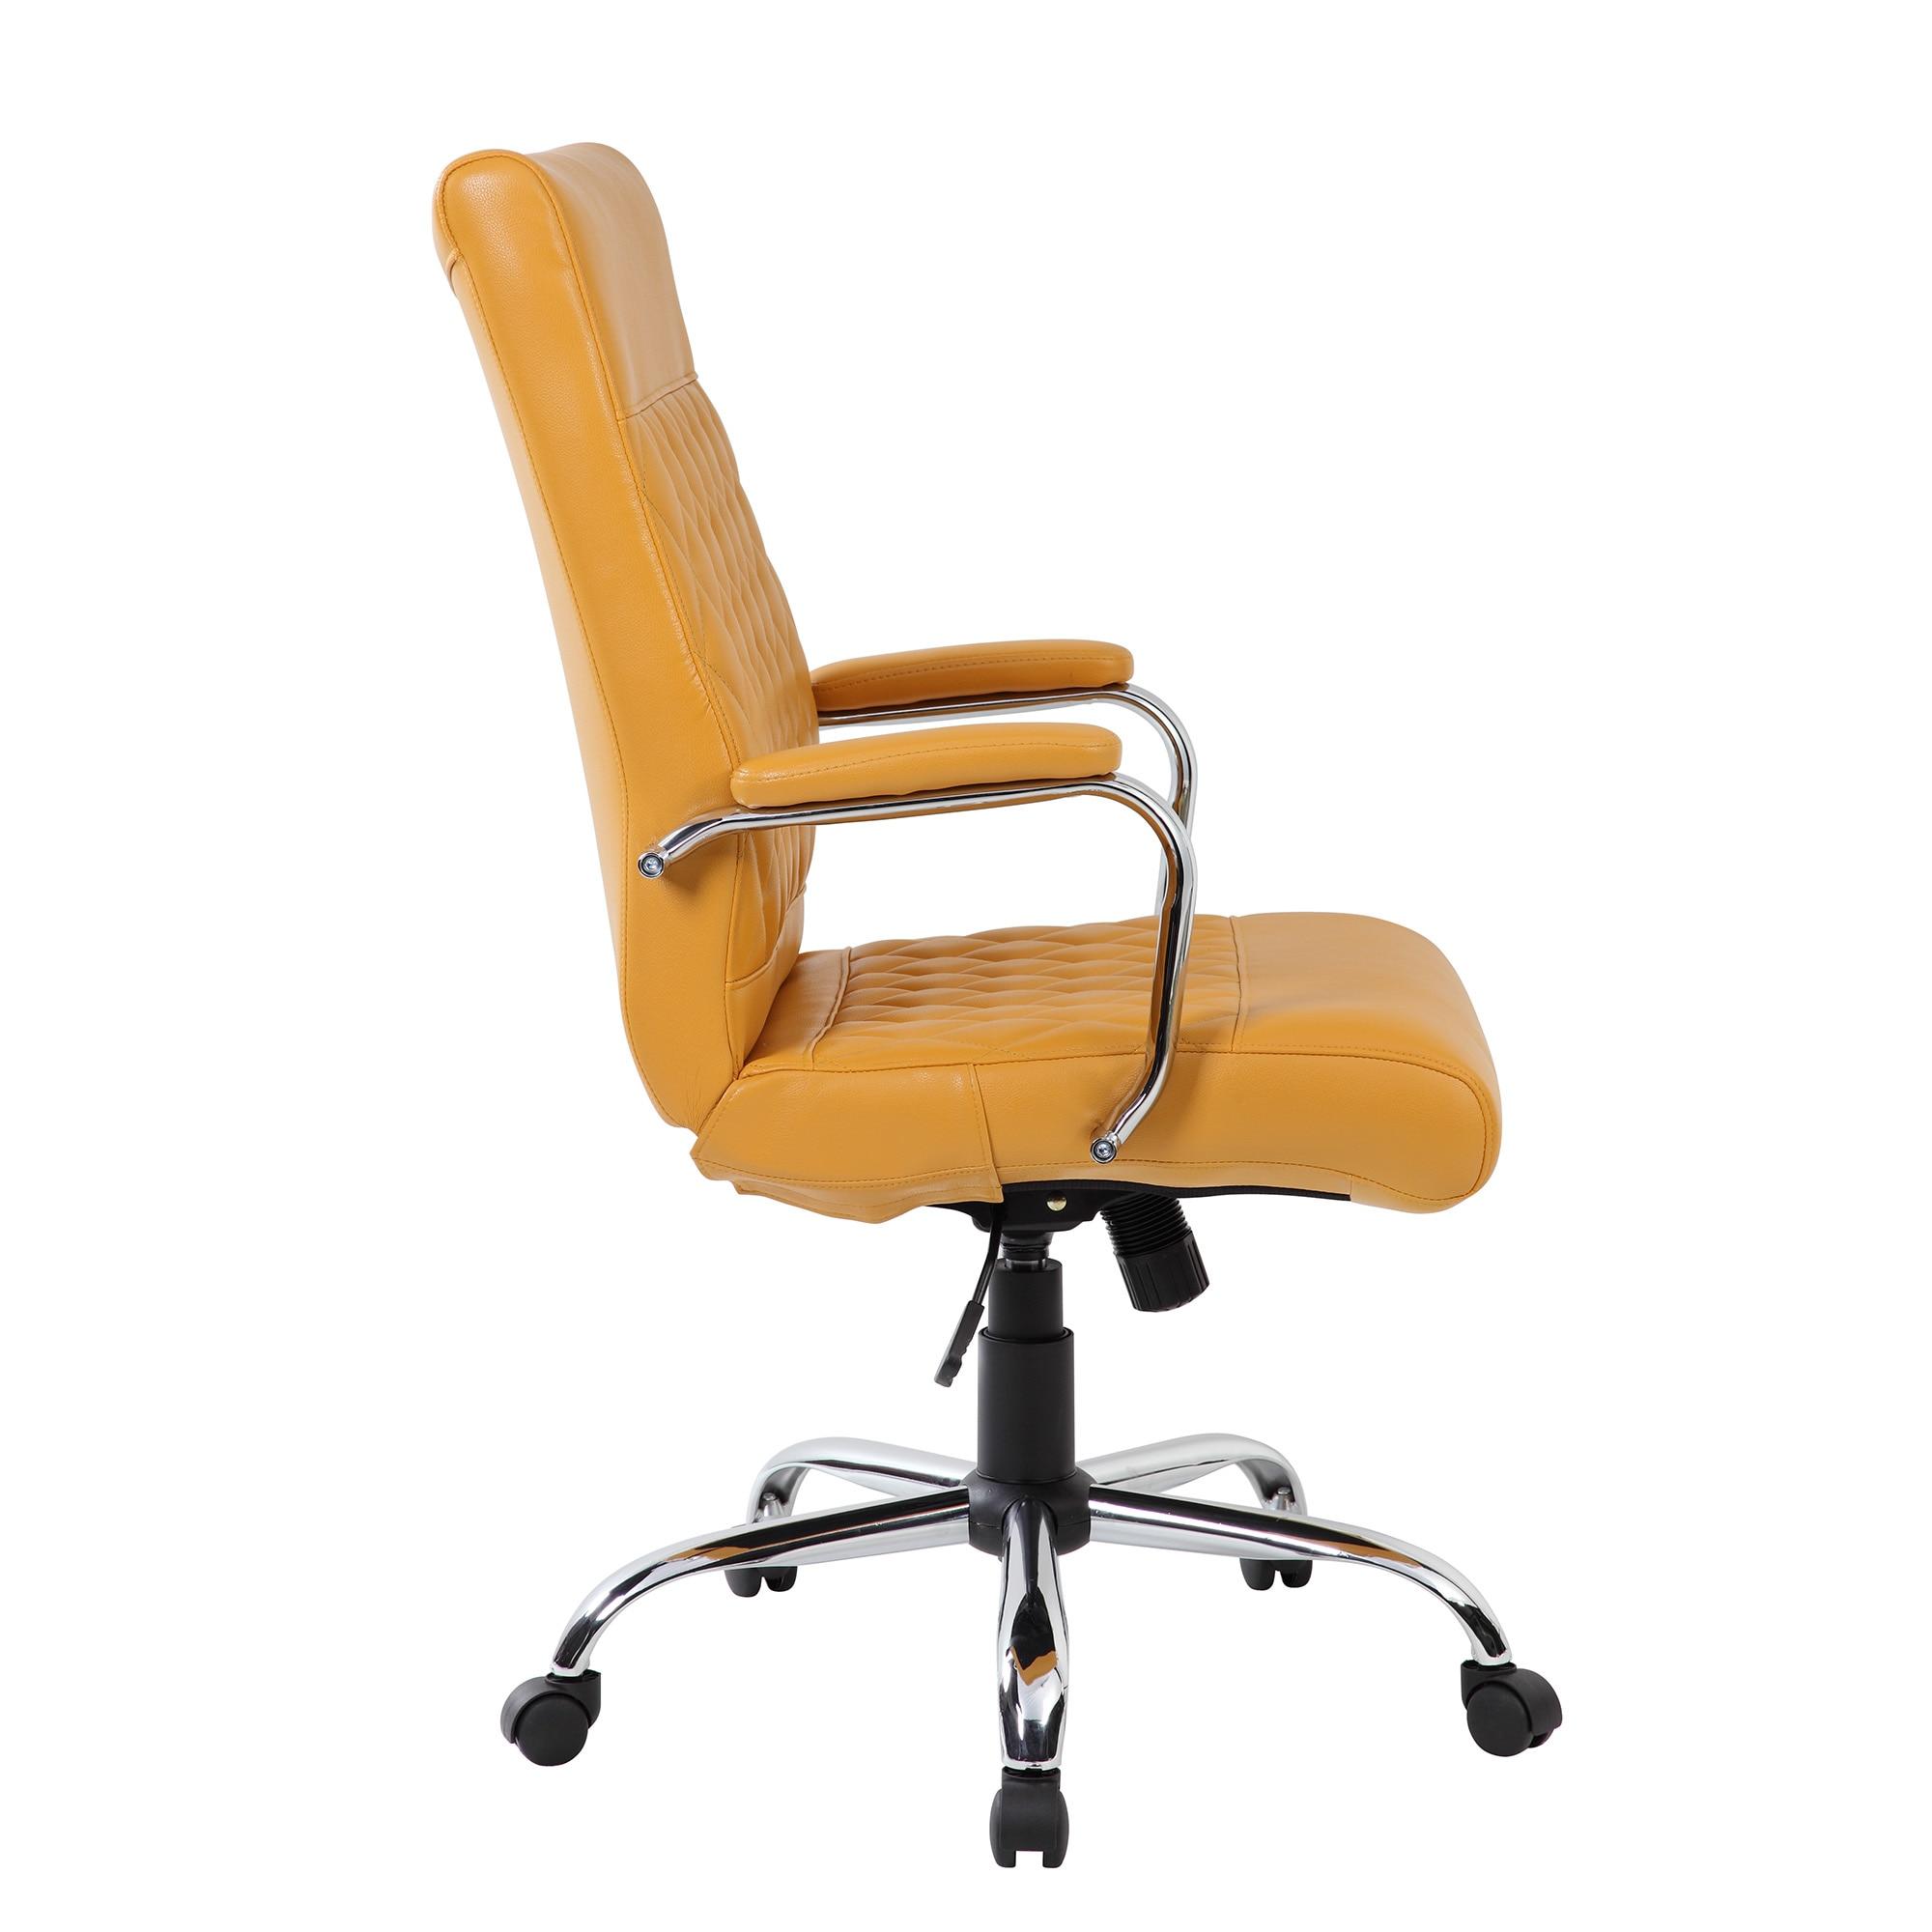 Kring Code Irodai szék, ergonomikus, Sárga fTprvK